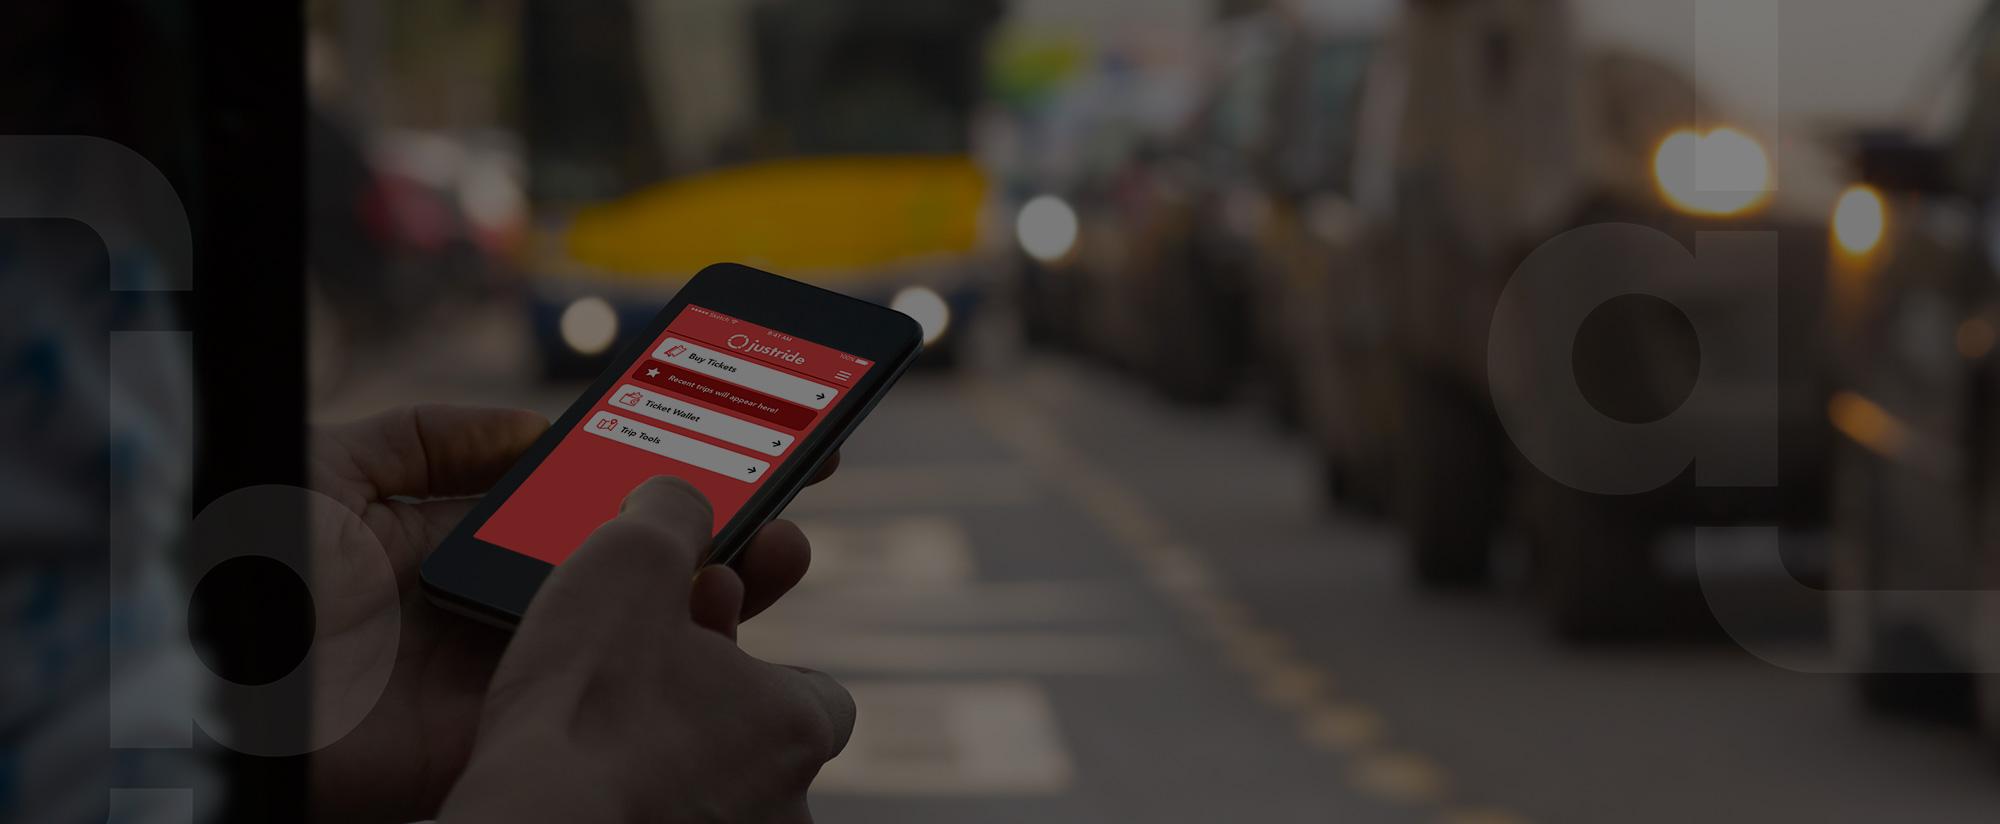 mobile-ticketing-02.jpg